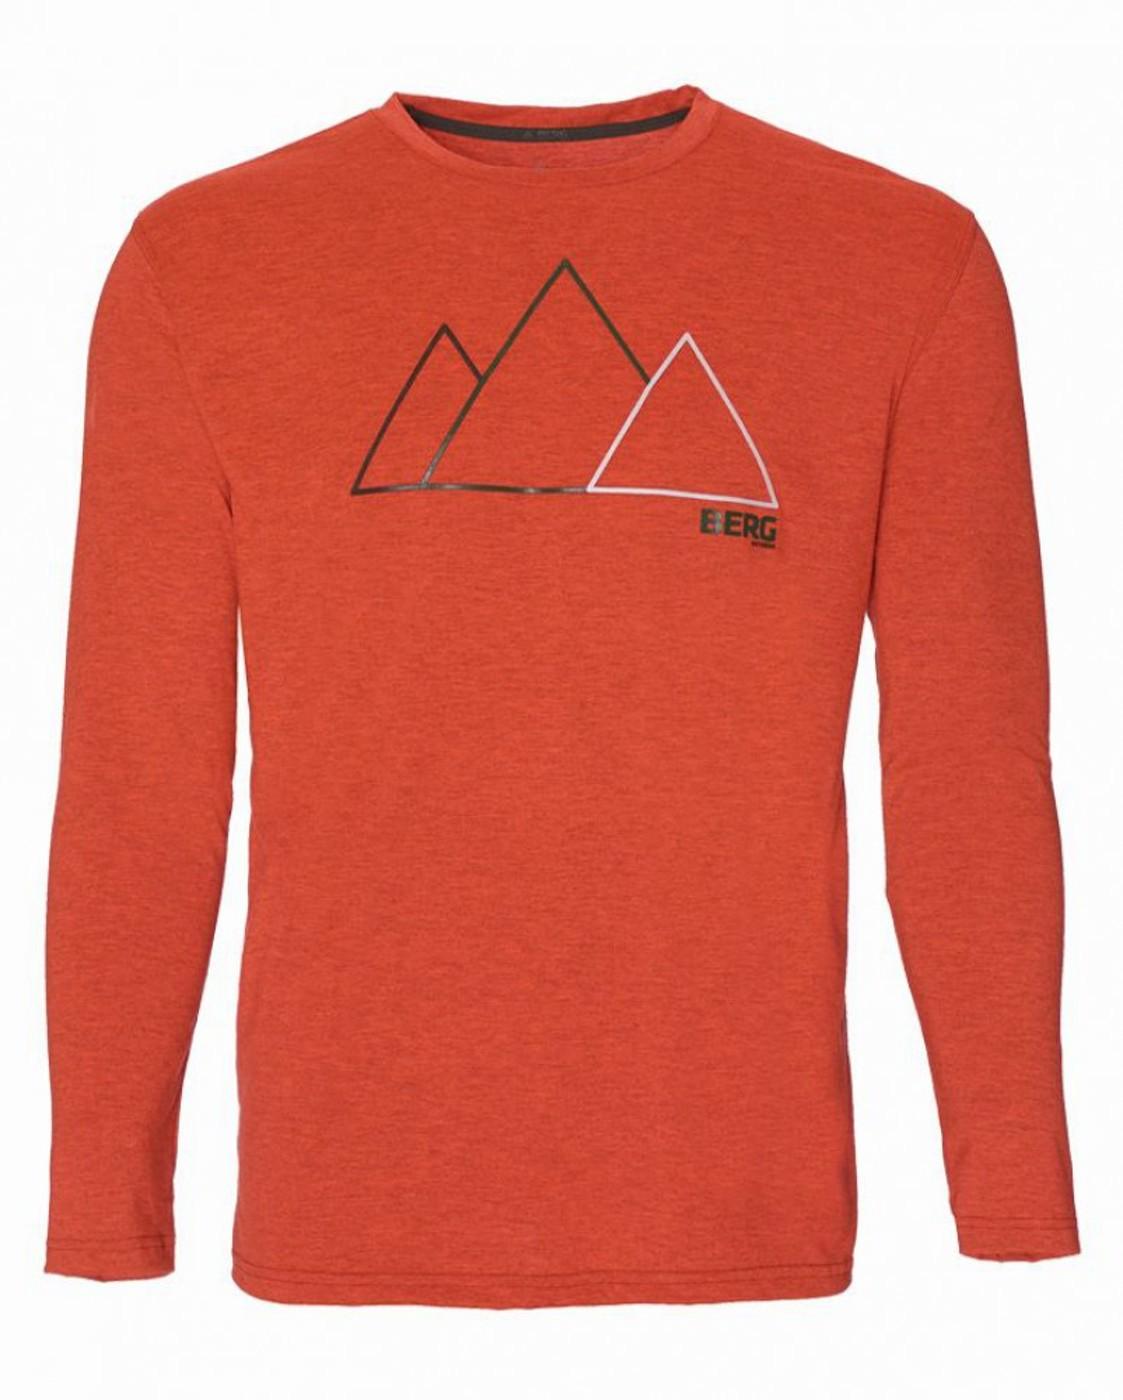 BERG Tech Lg-sleeve T-shirt CORUJAS - Herren